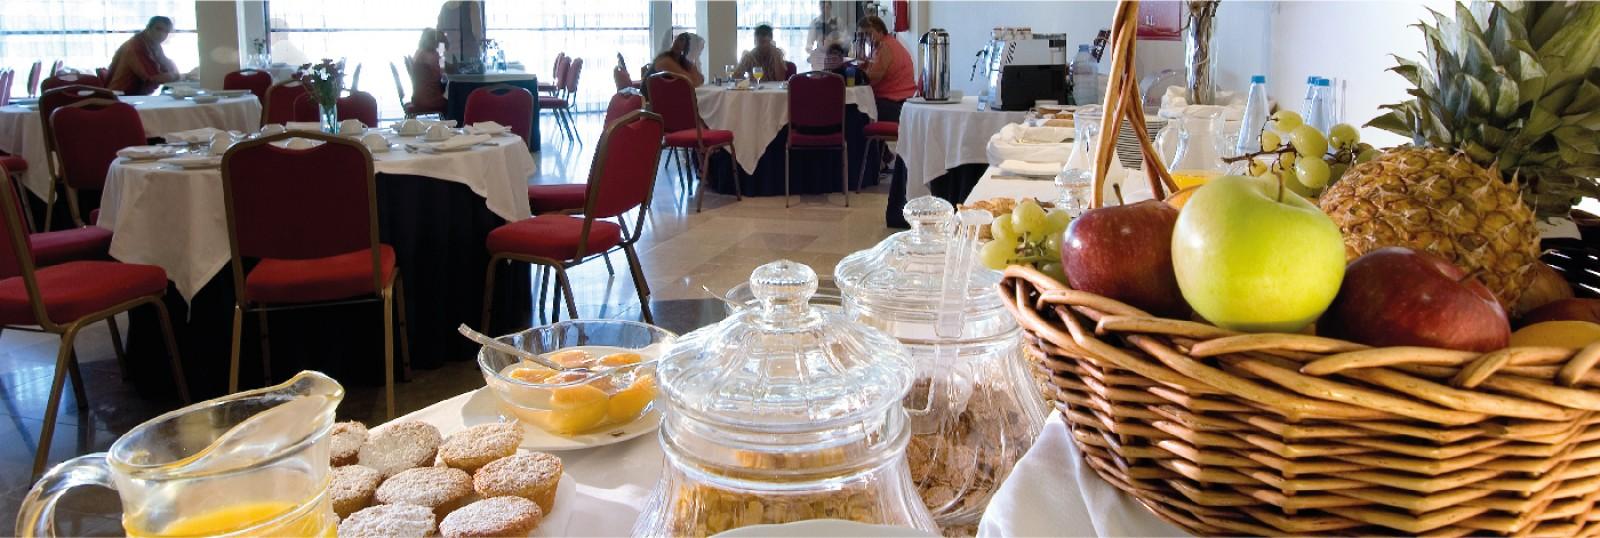 Hotel Eurosol Alcanena - Pequeno-almoço